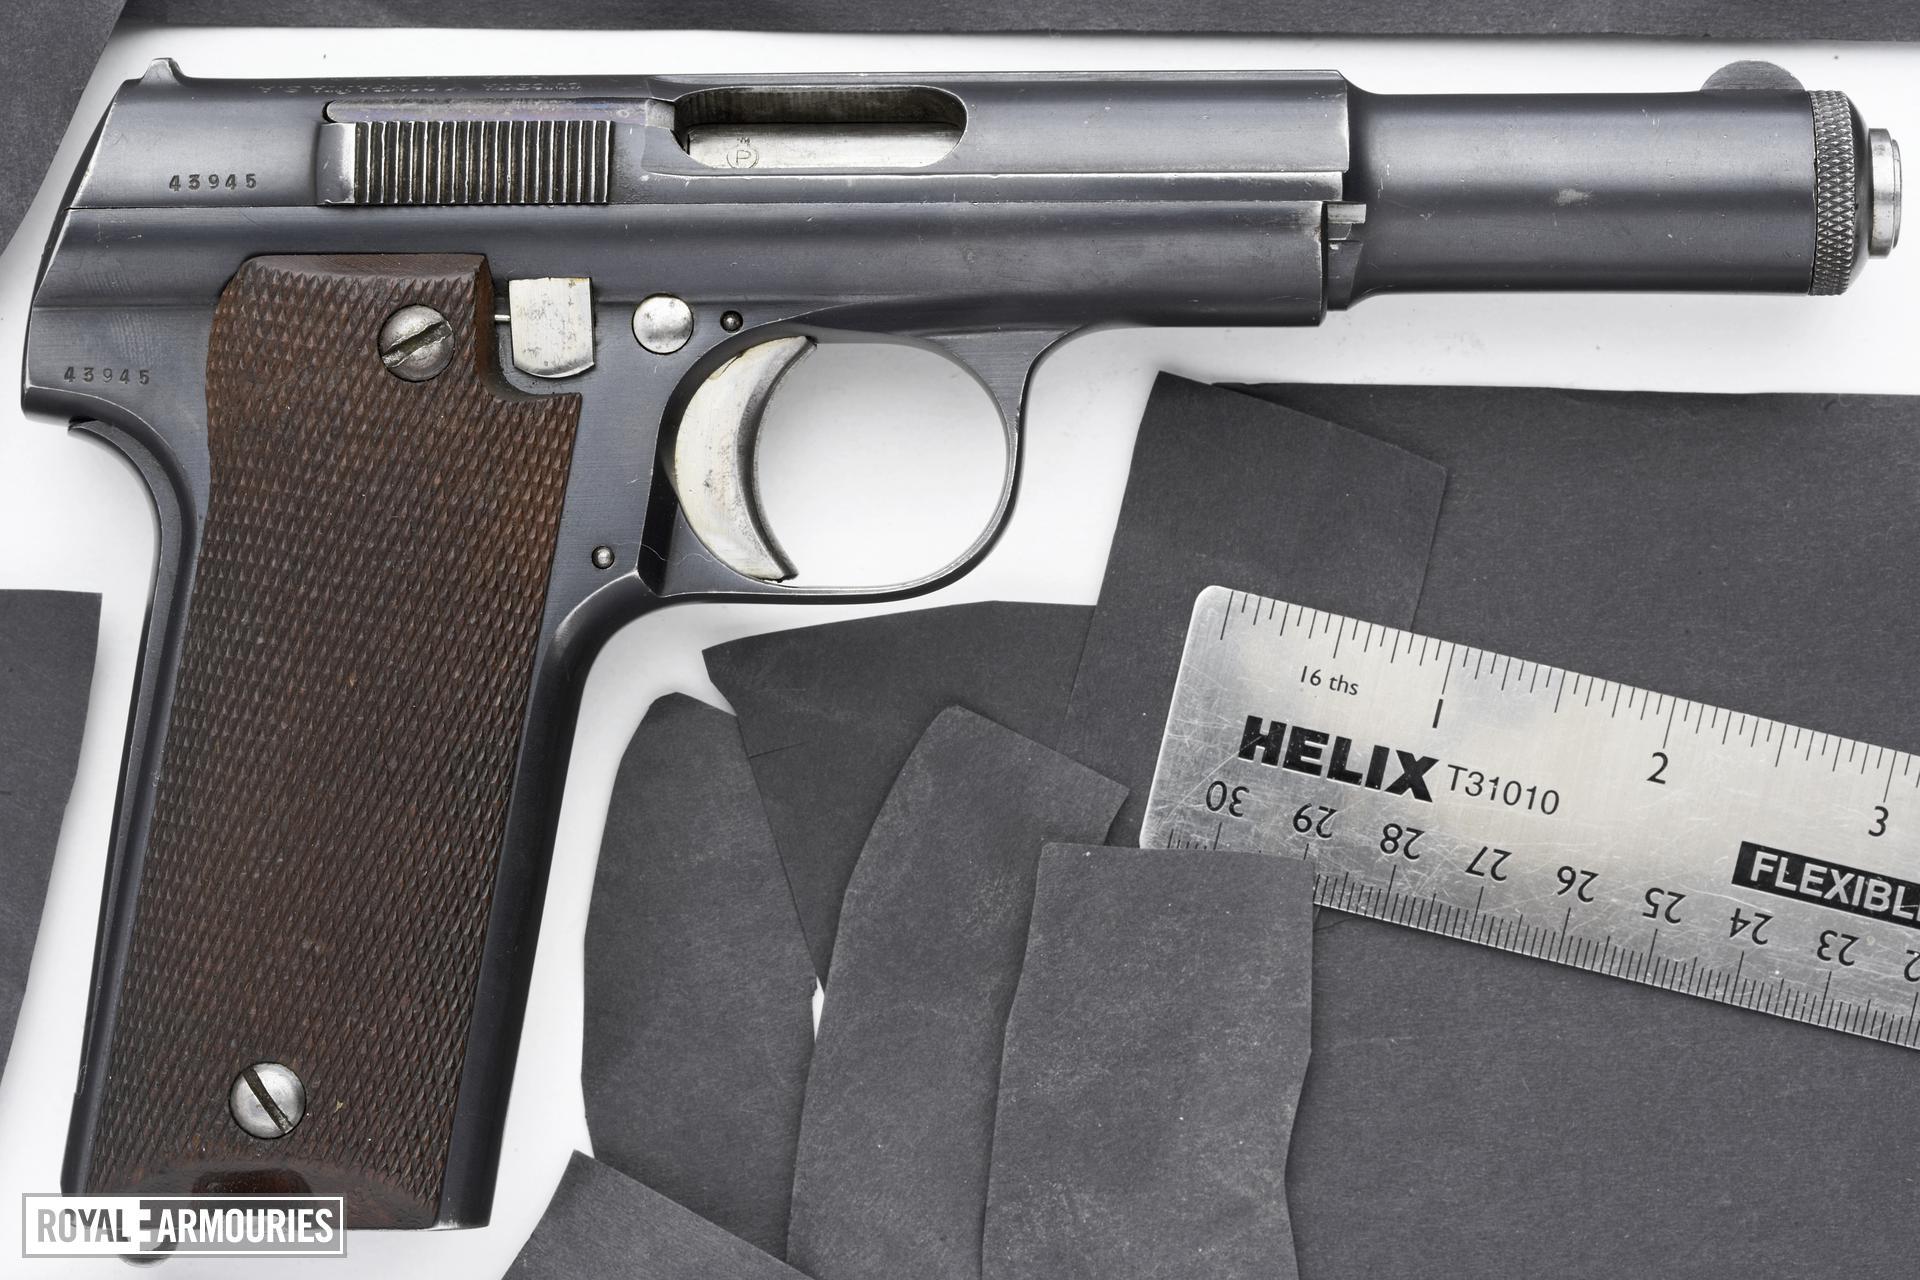 Centrefire self-loading pistol - Astra Model 600